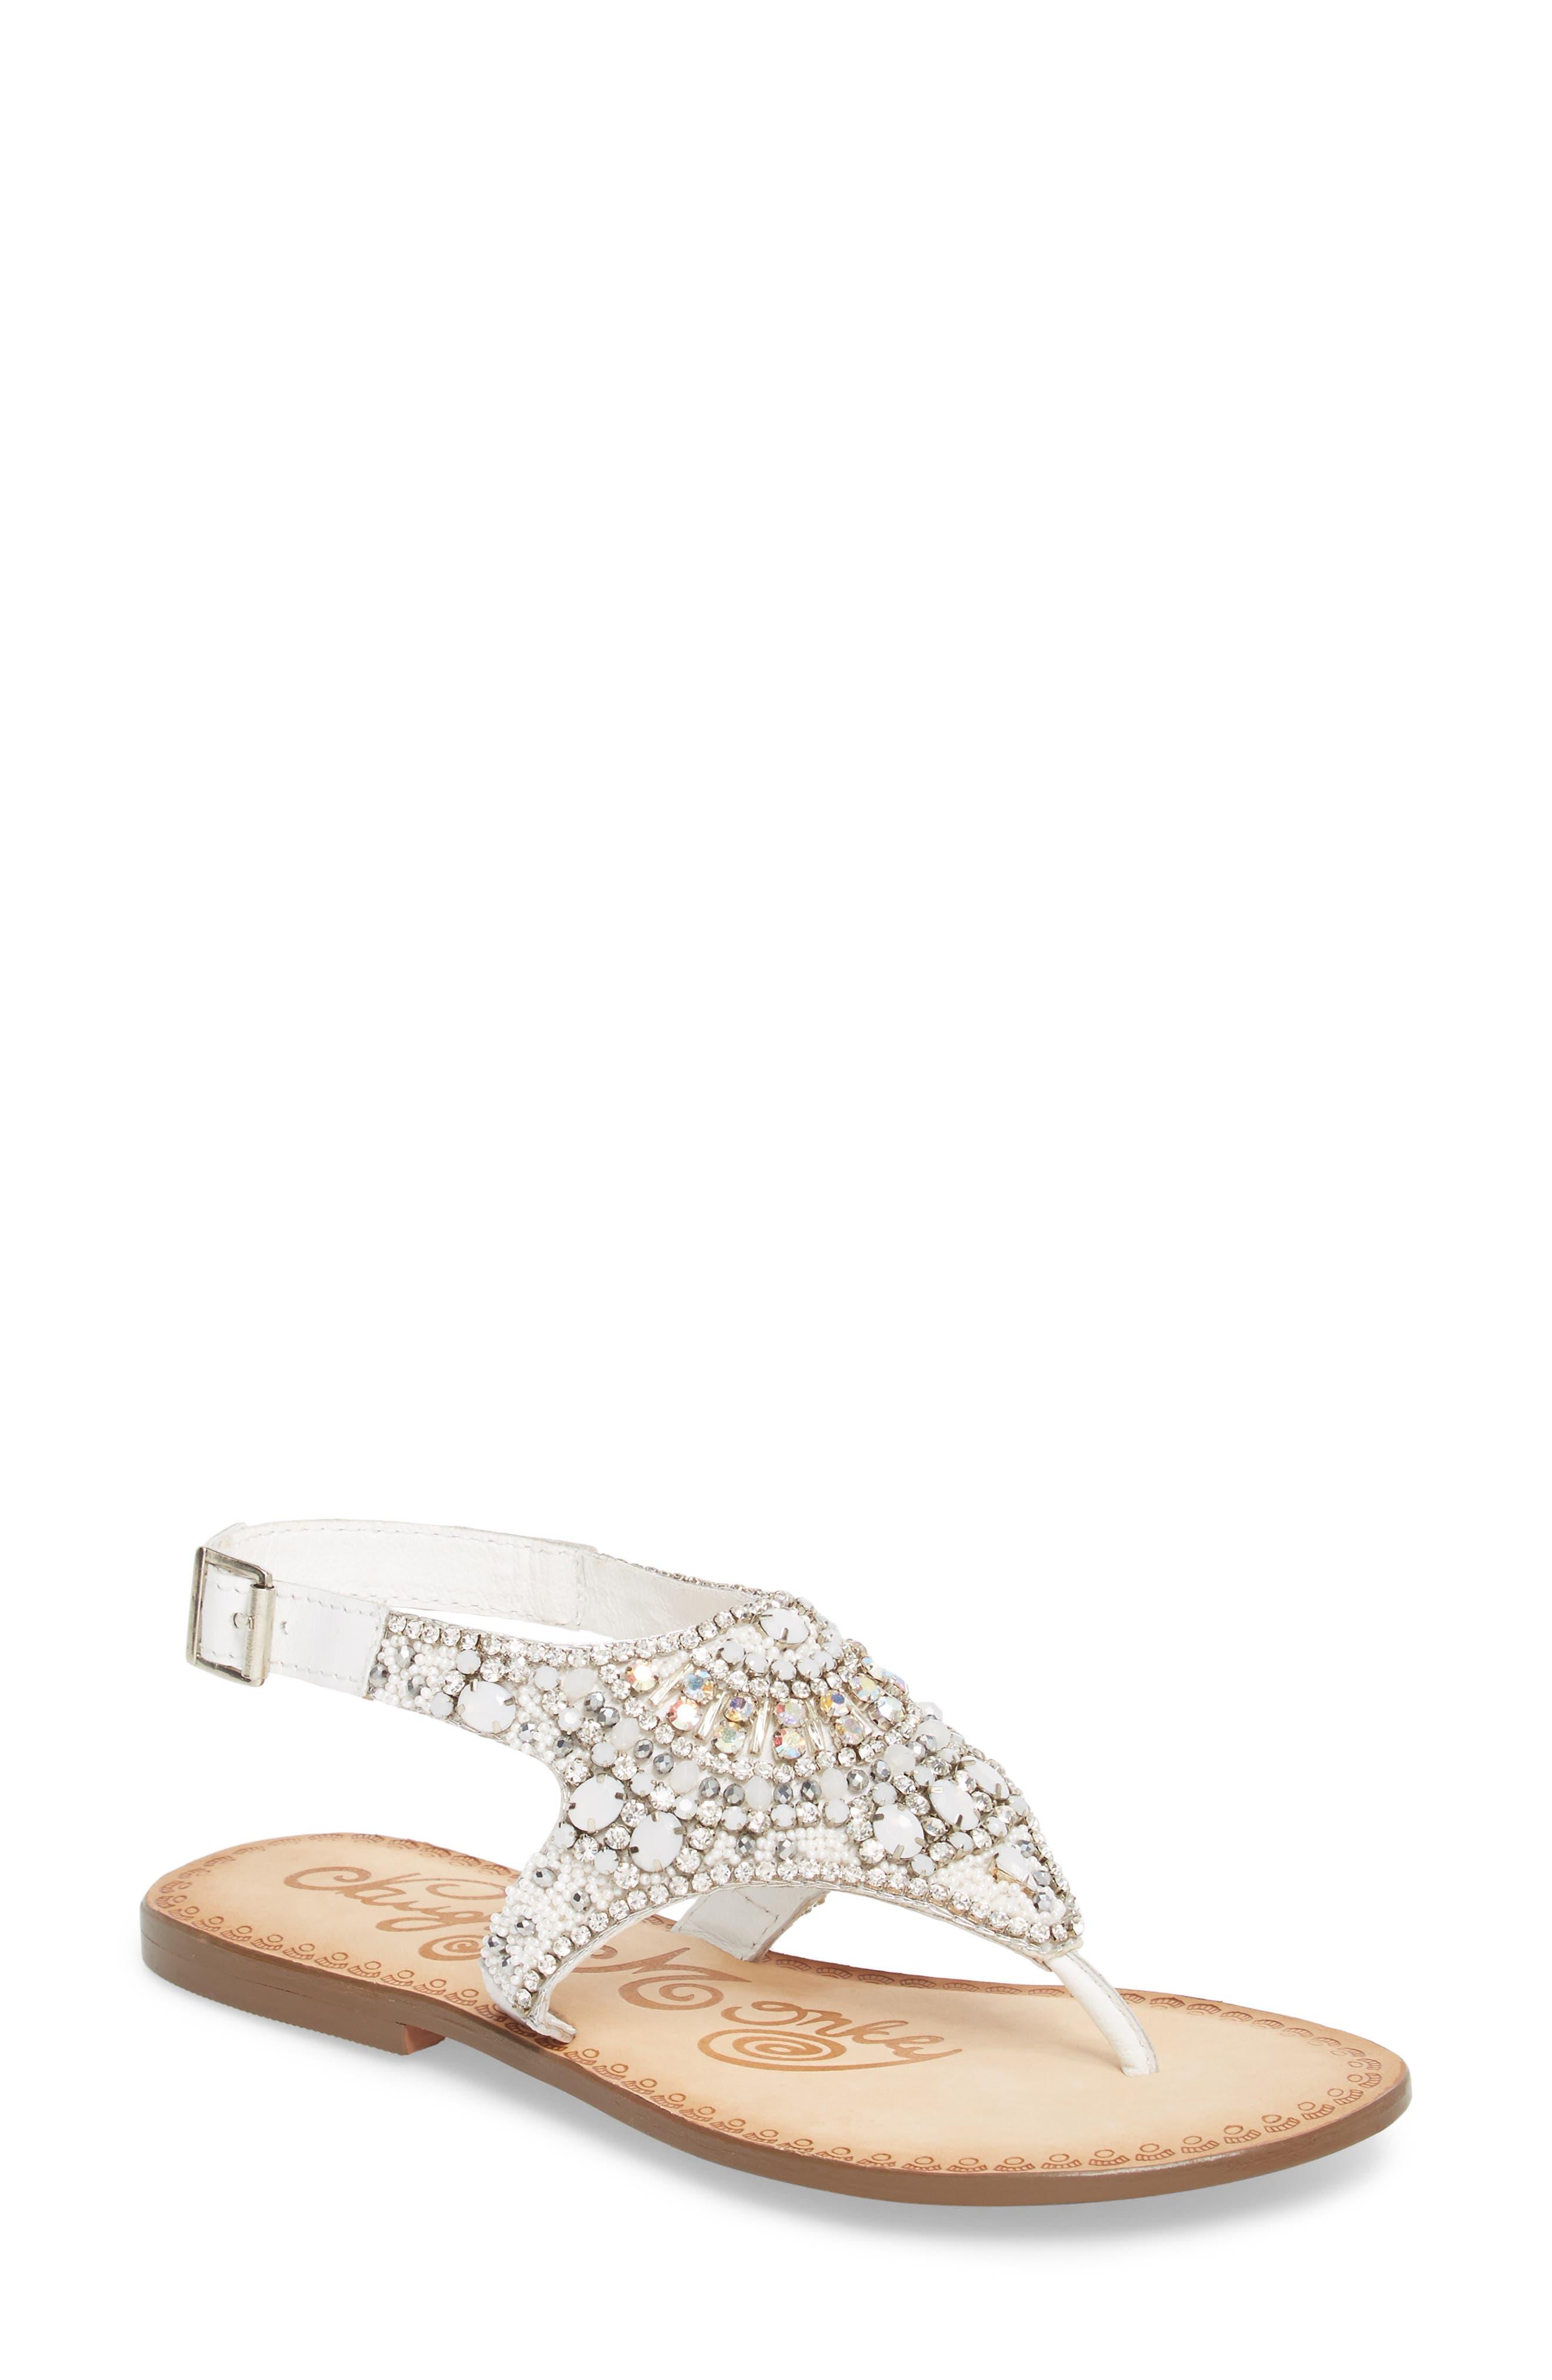 Iceberg Crystal Embellished Sandal,                         Main,                         color, White Leather